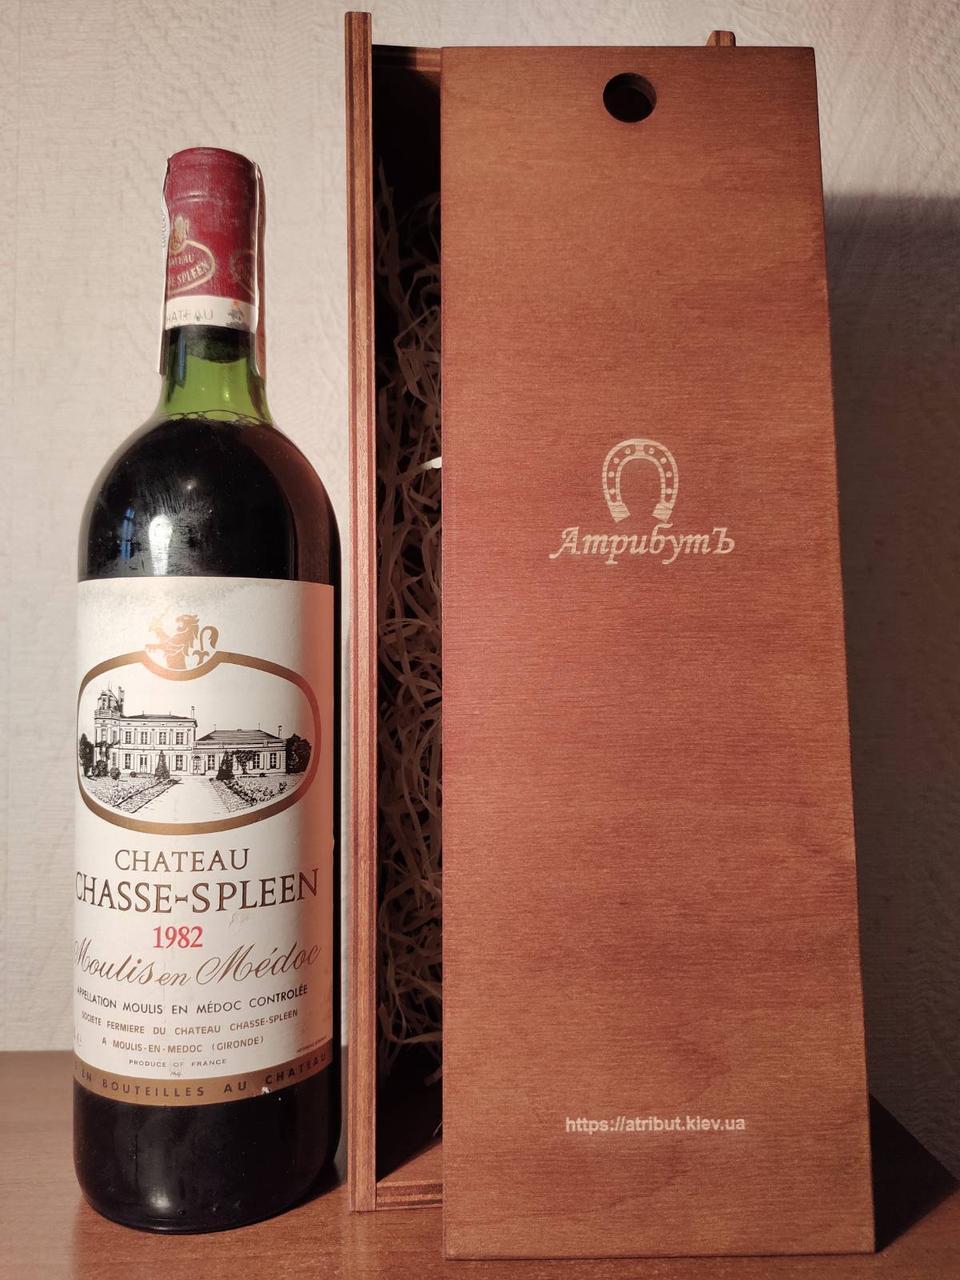 Вино 1982 року Chateau Chasse Spleen Moulis en Medoc Франція